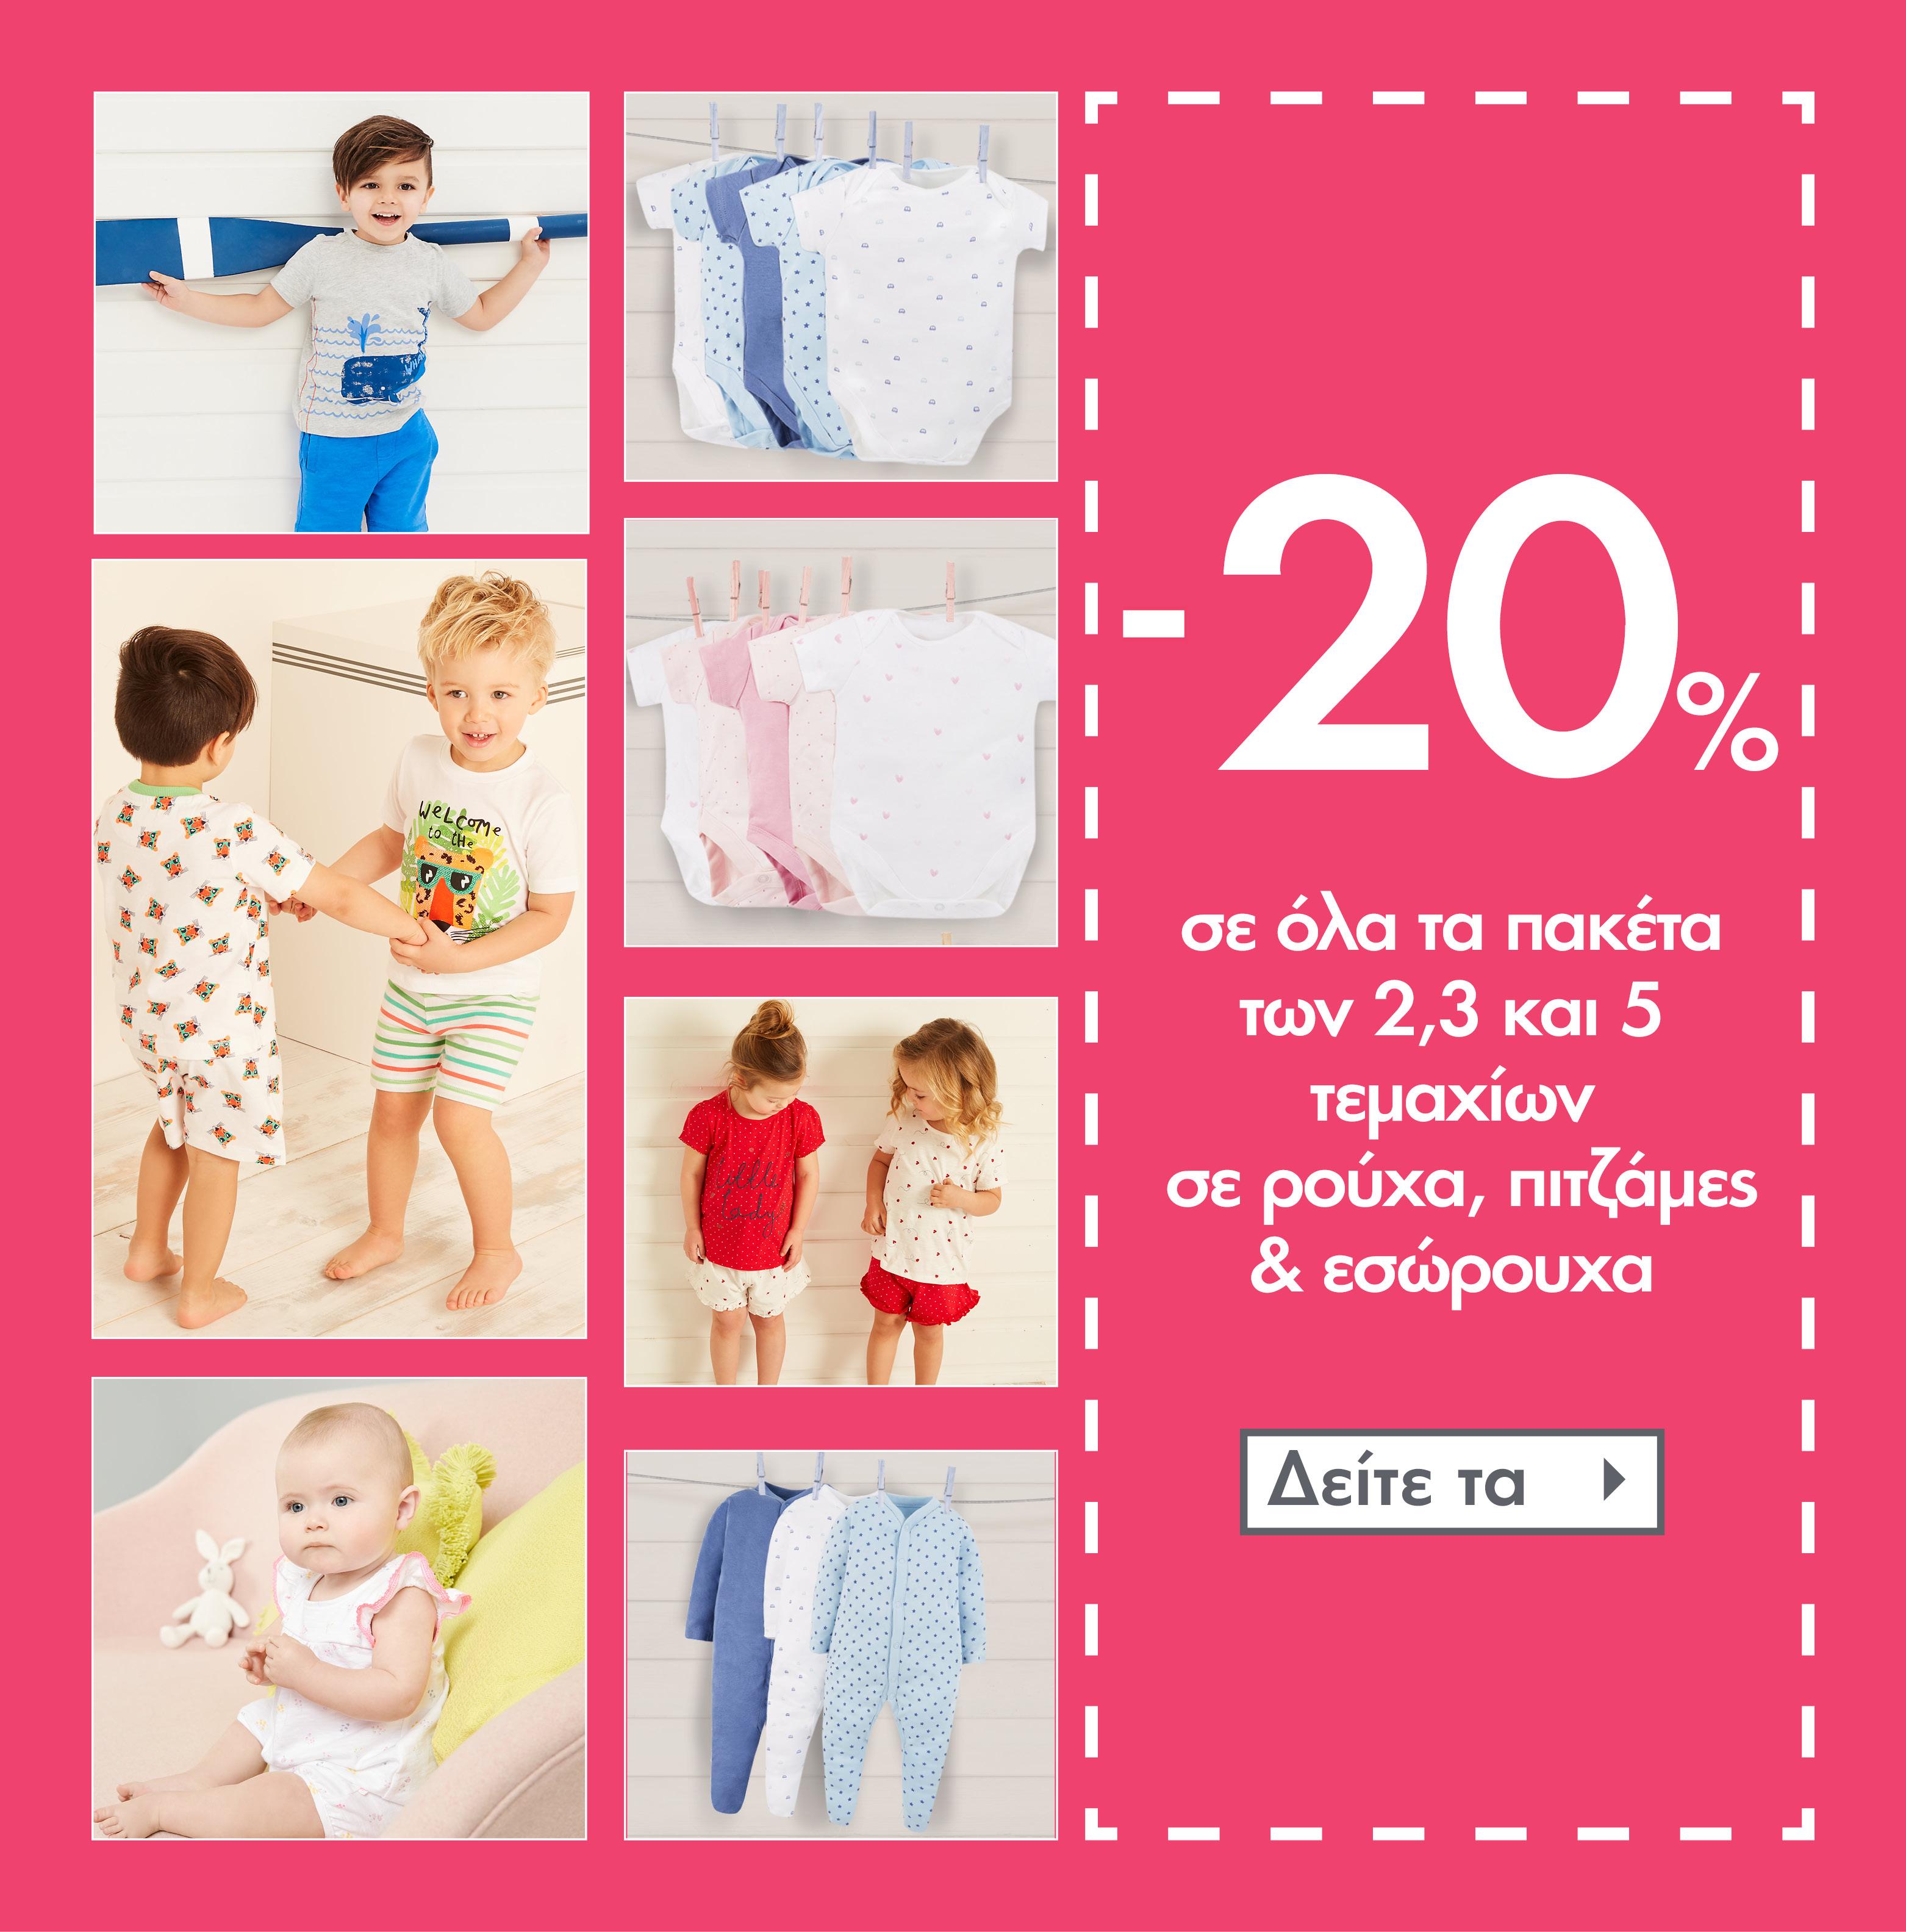 9380bab5445 Καρότσια, παιδικά, βρεφικά και ρούχα εγκυμοσύνης από το Mothercare